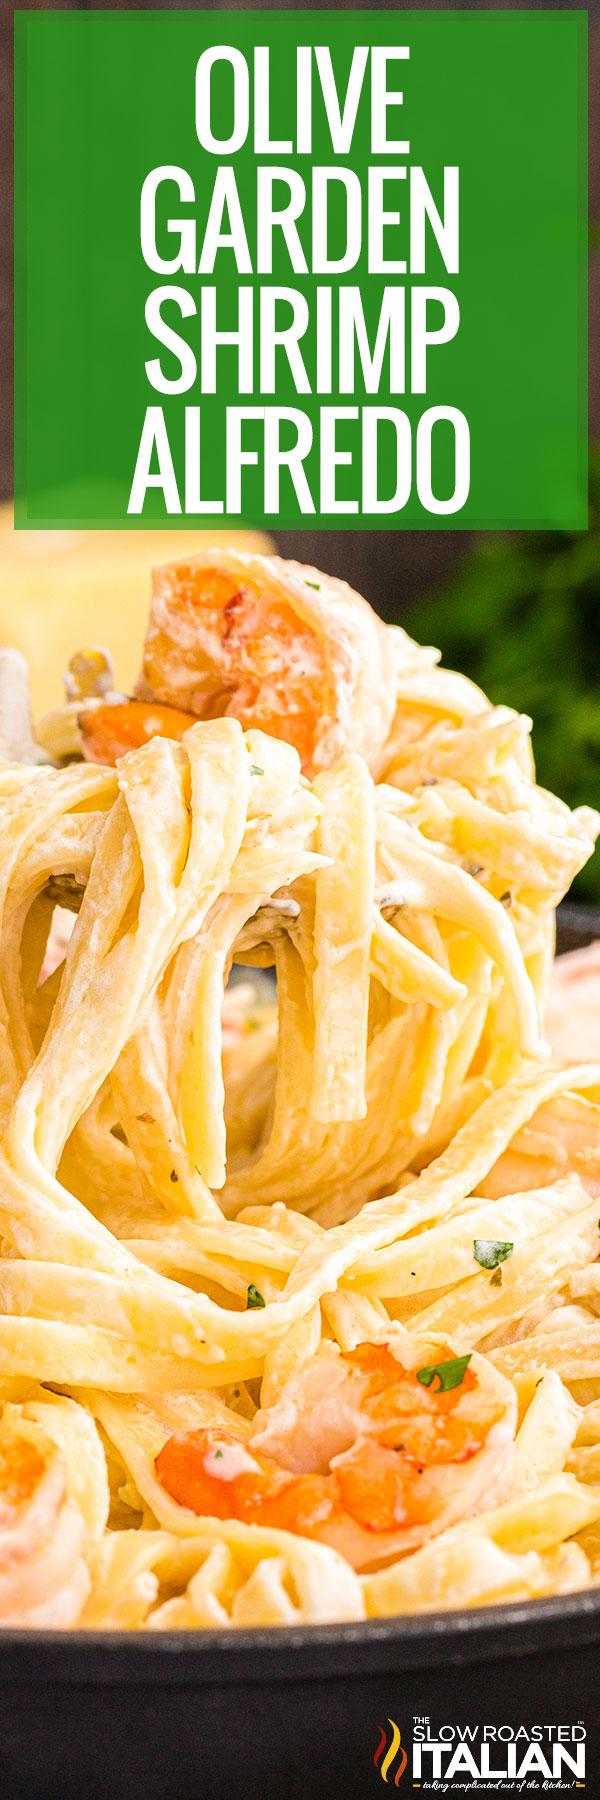 Olive Garden Shrimp Alfredo Recipe Closeup